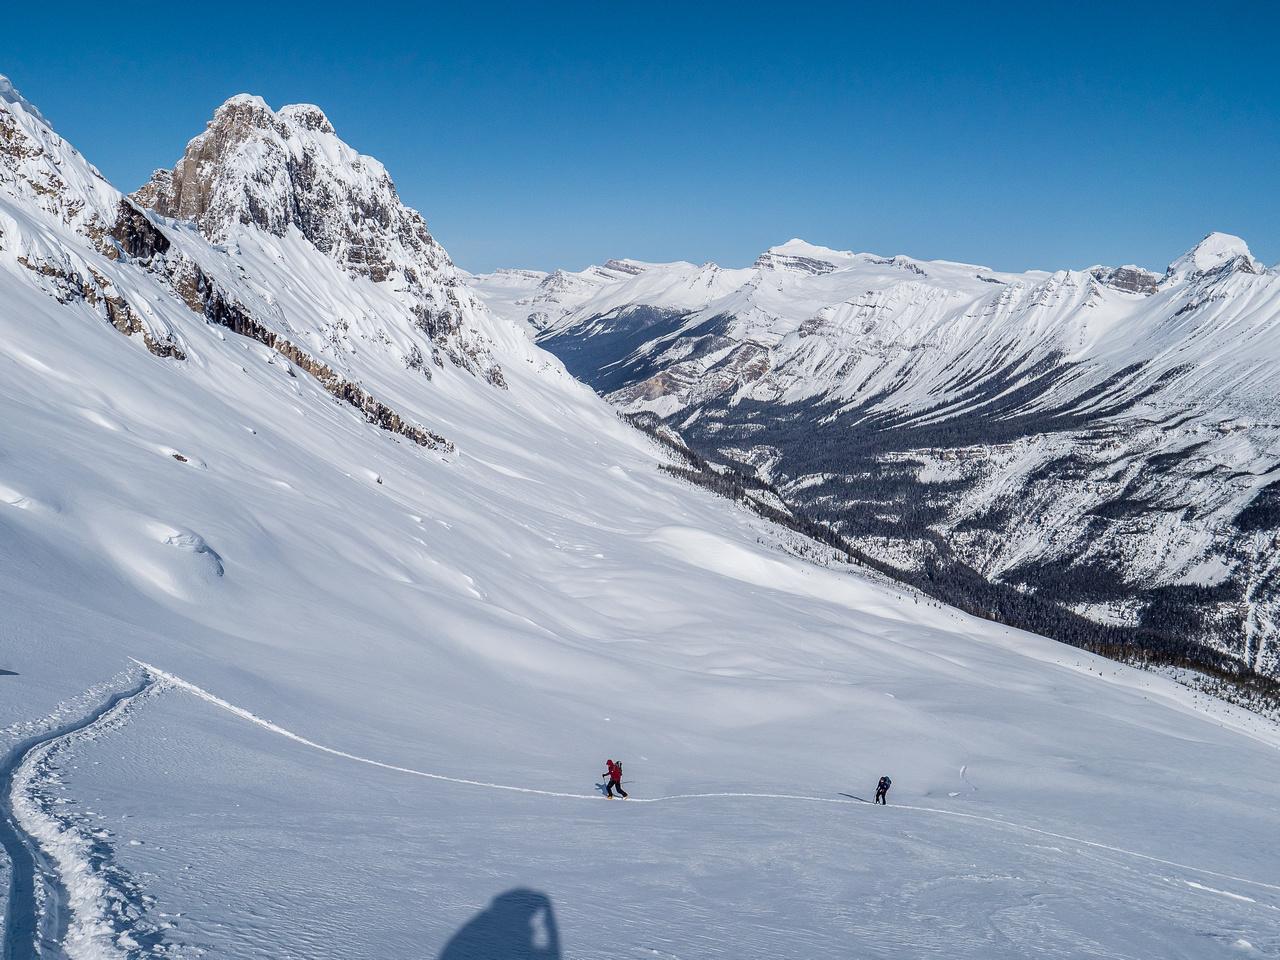 Skinning towards the upper mountain.